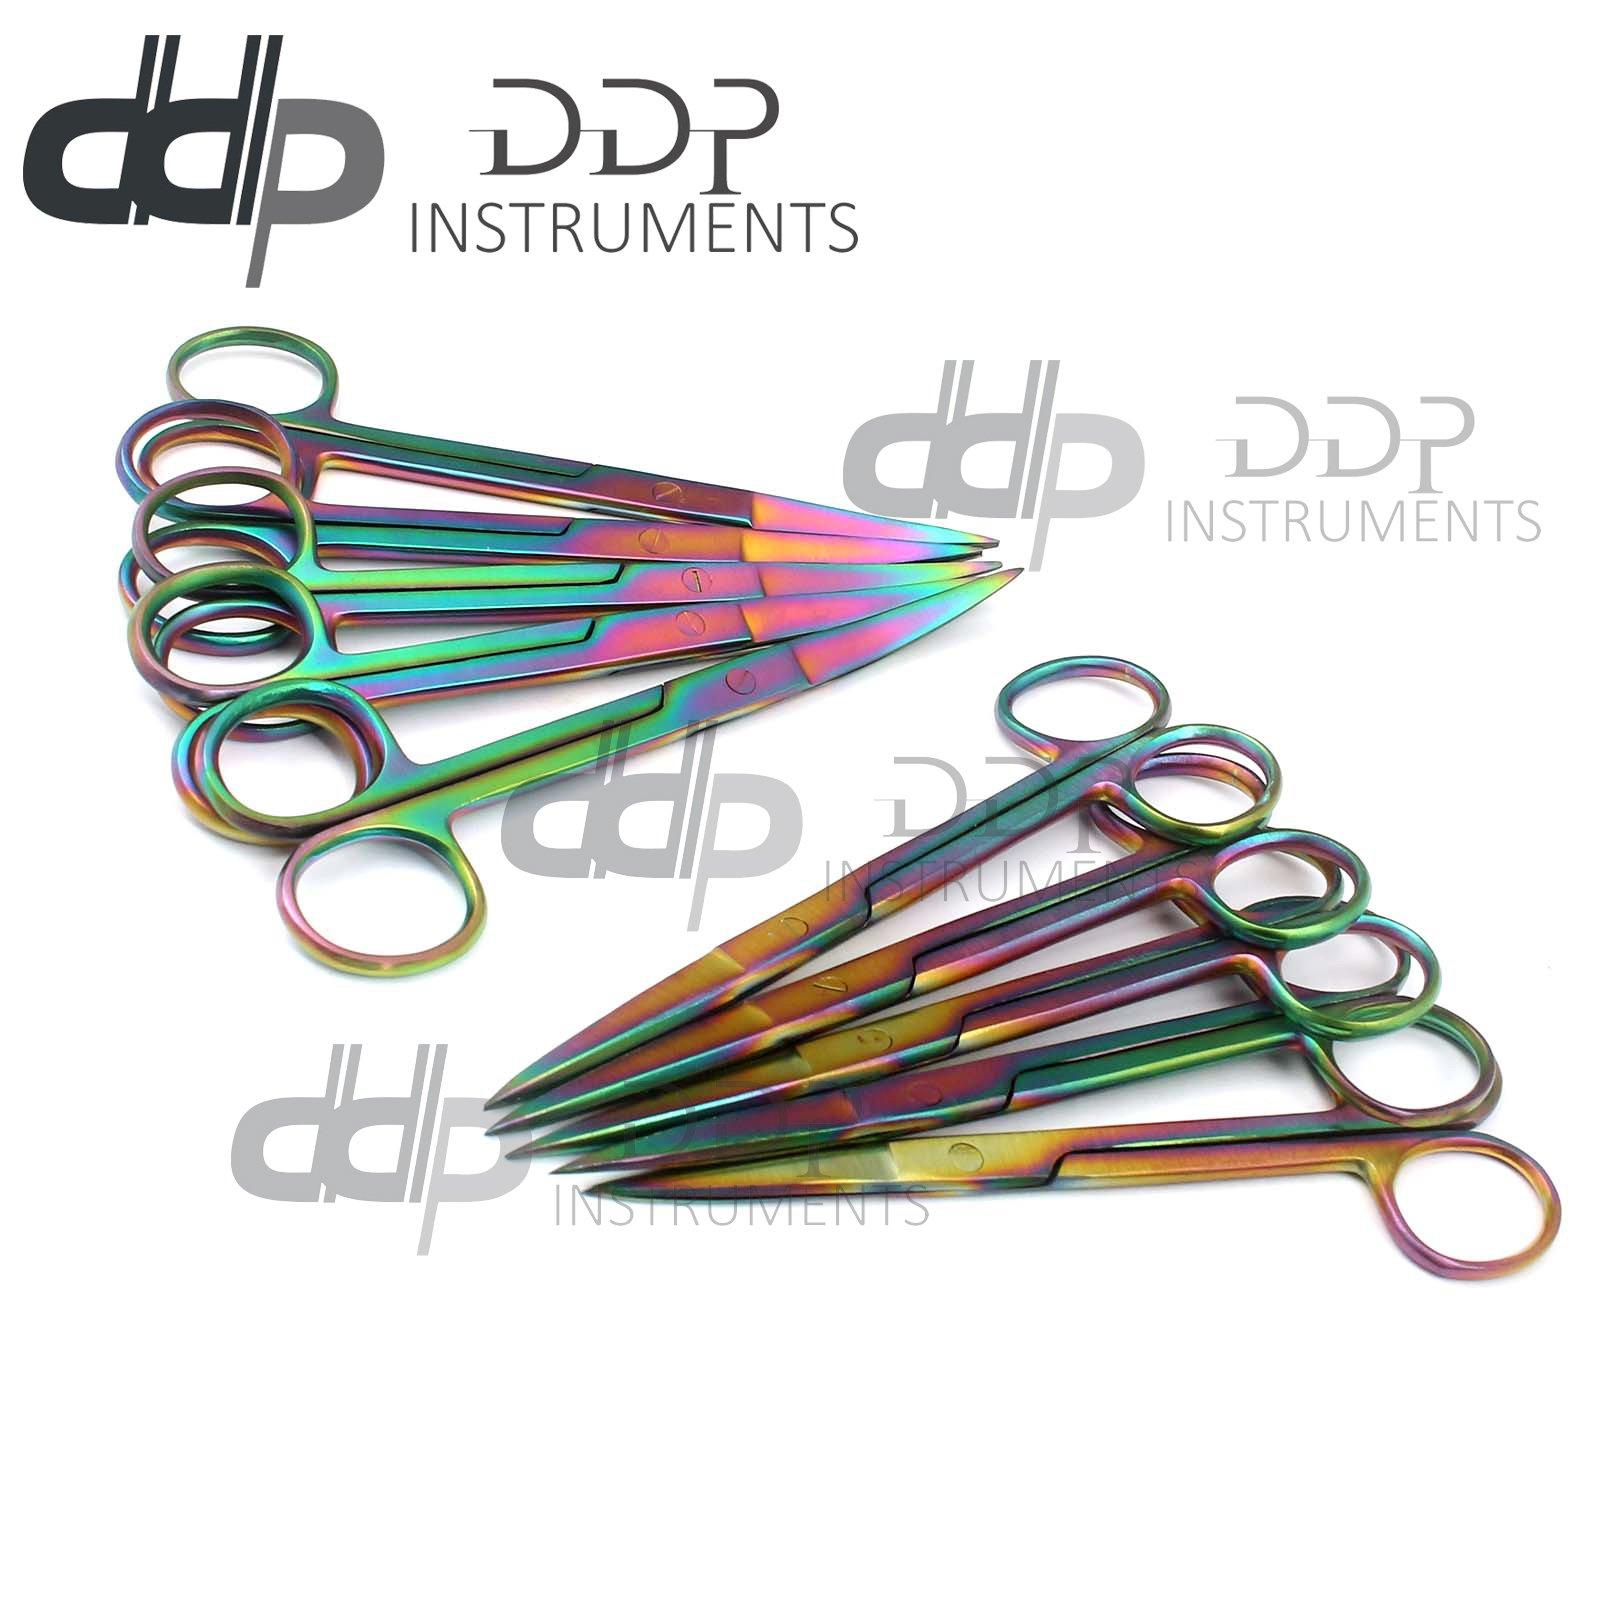 DDP Set of 12 Multi Titanium Color Rainbow Operating Scissor Sharp/Sharp 5.5'' Straight & Curved Stainless Steel